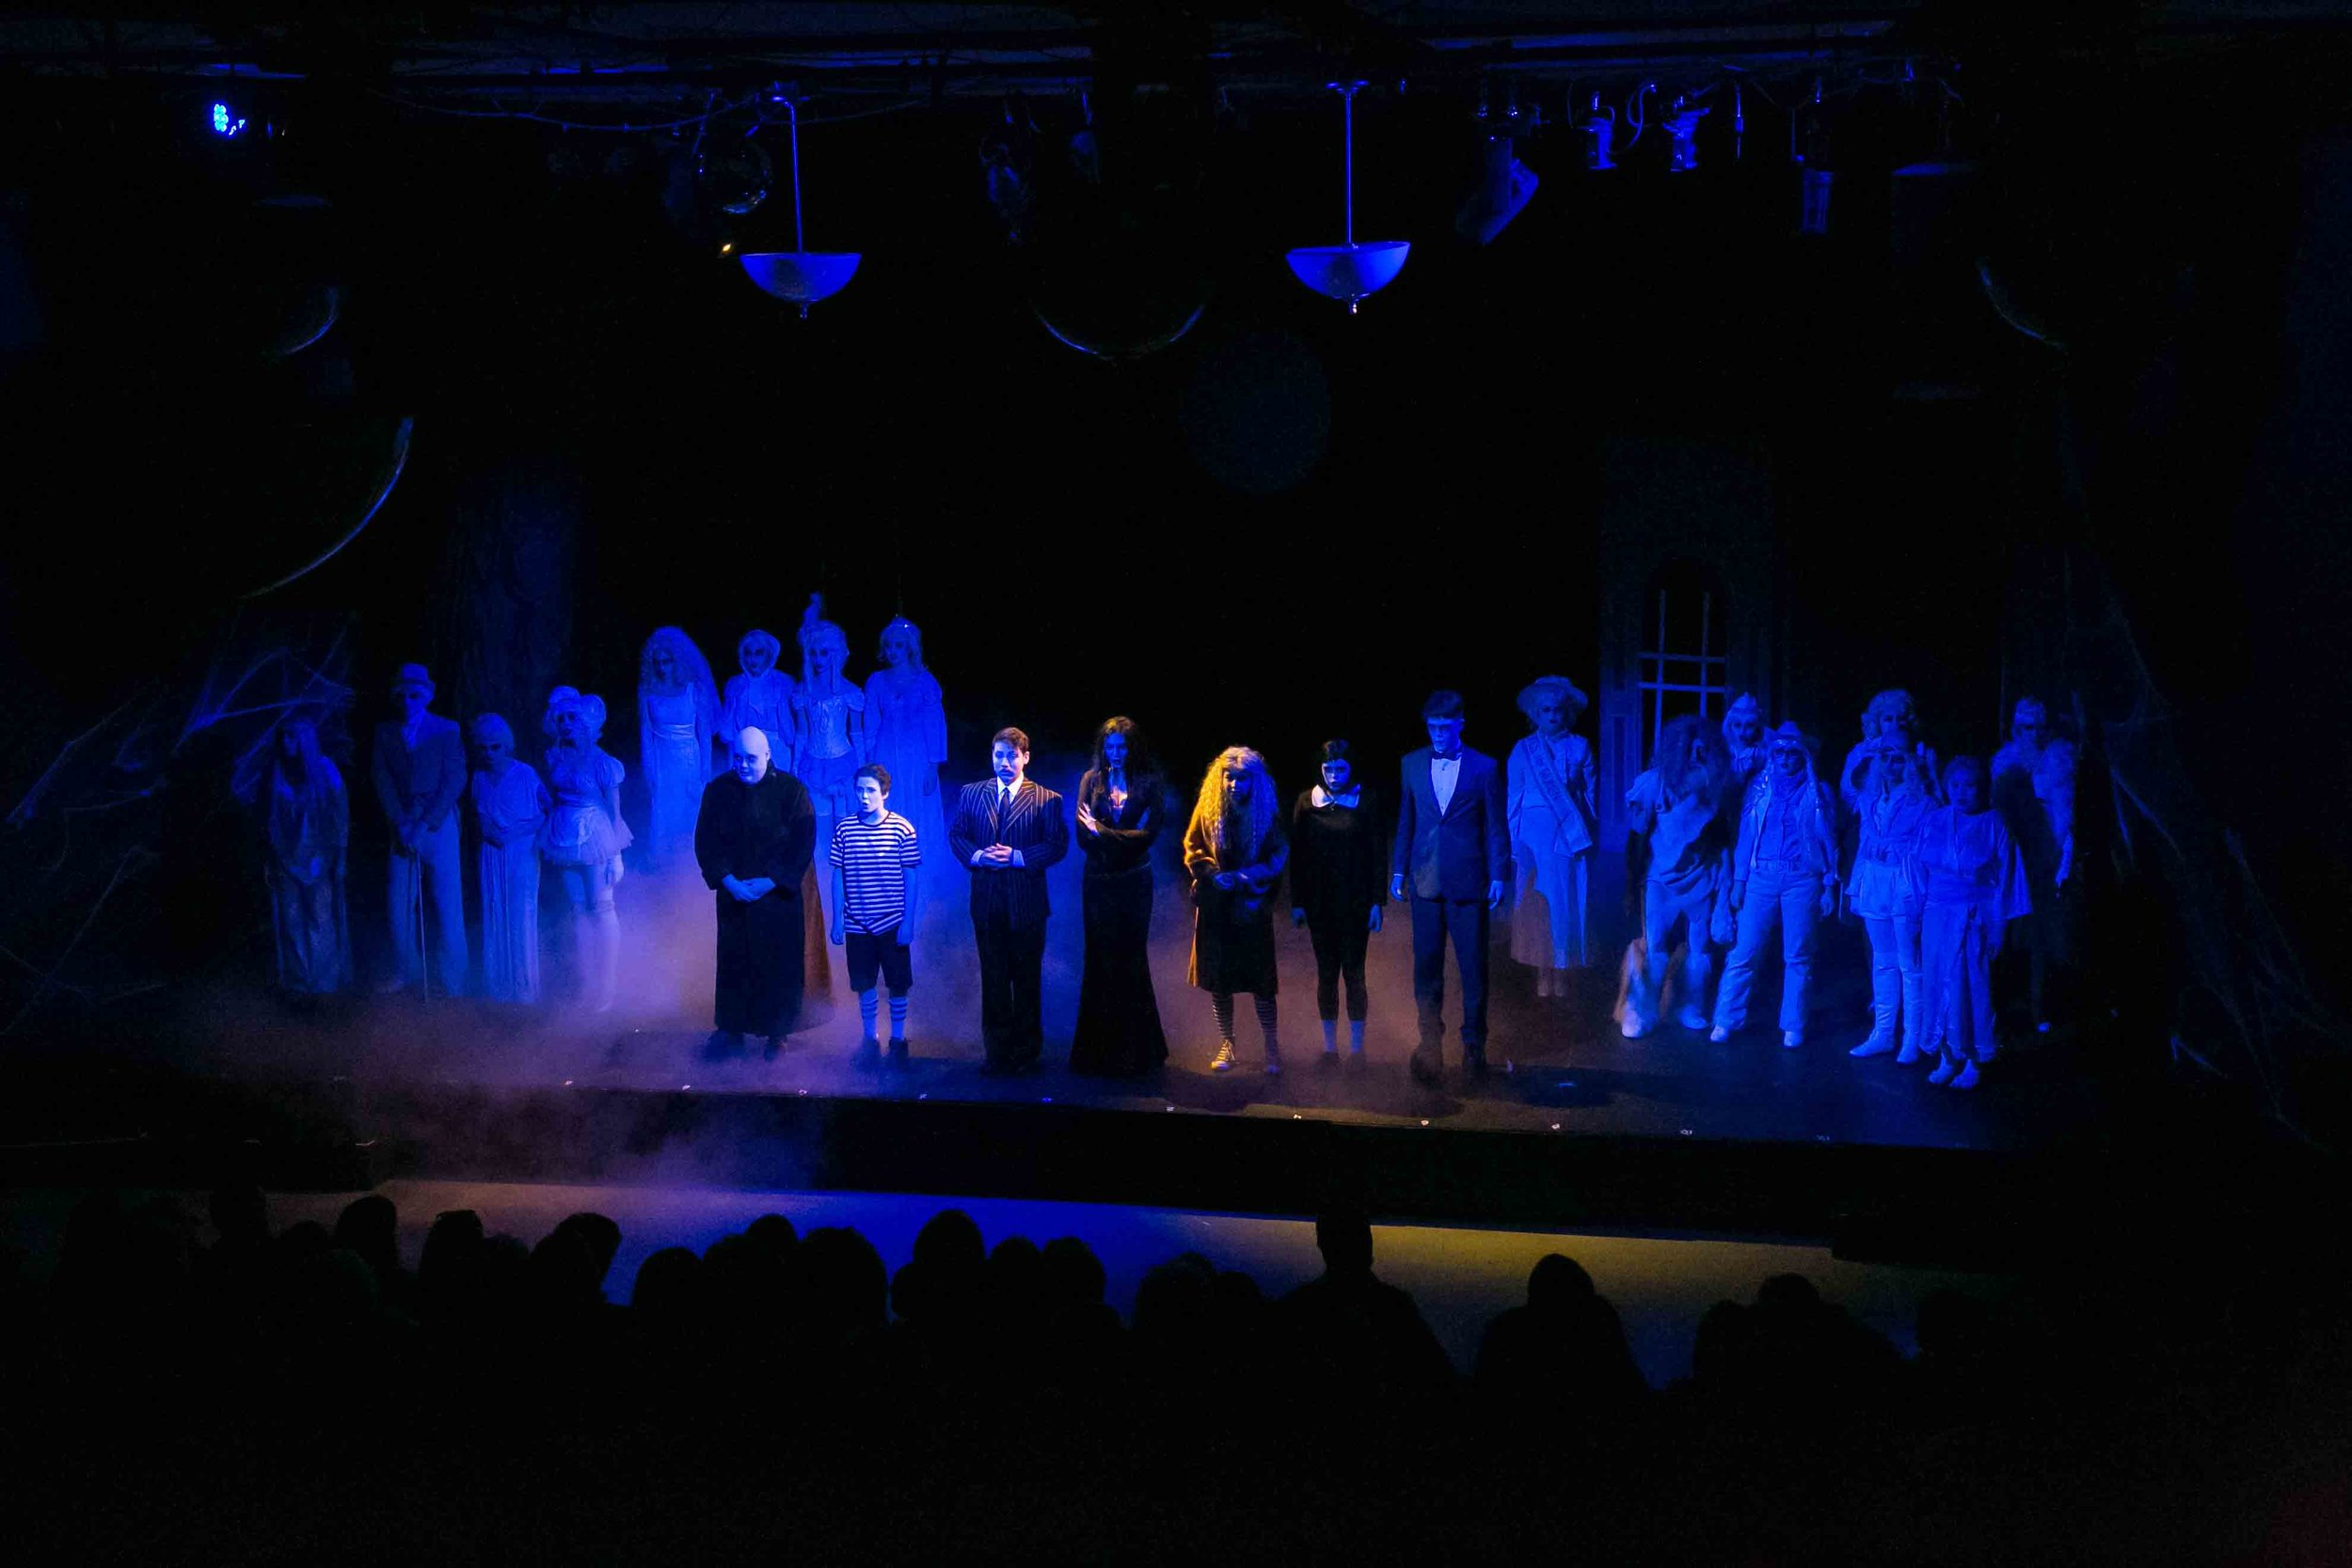 6-19-16 Addams Family Kooky Cast 0048.jpg